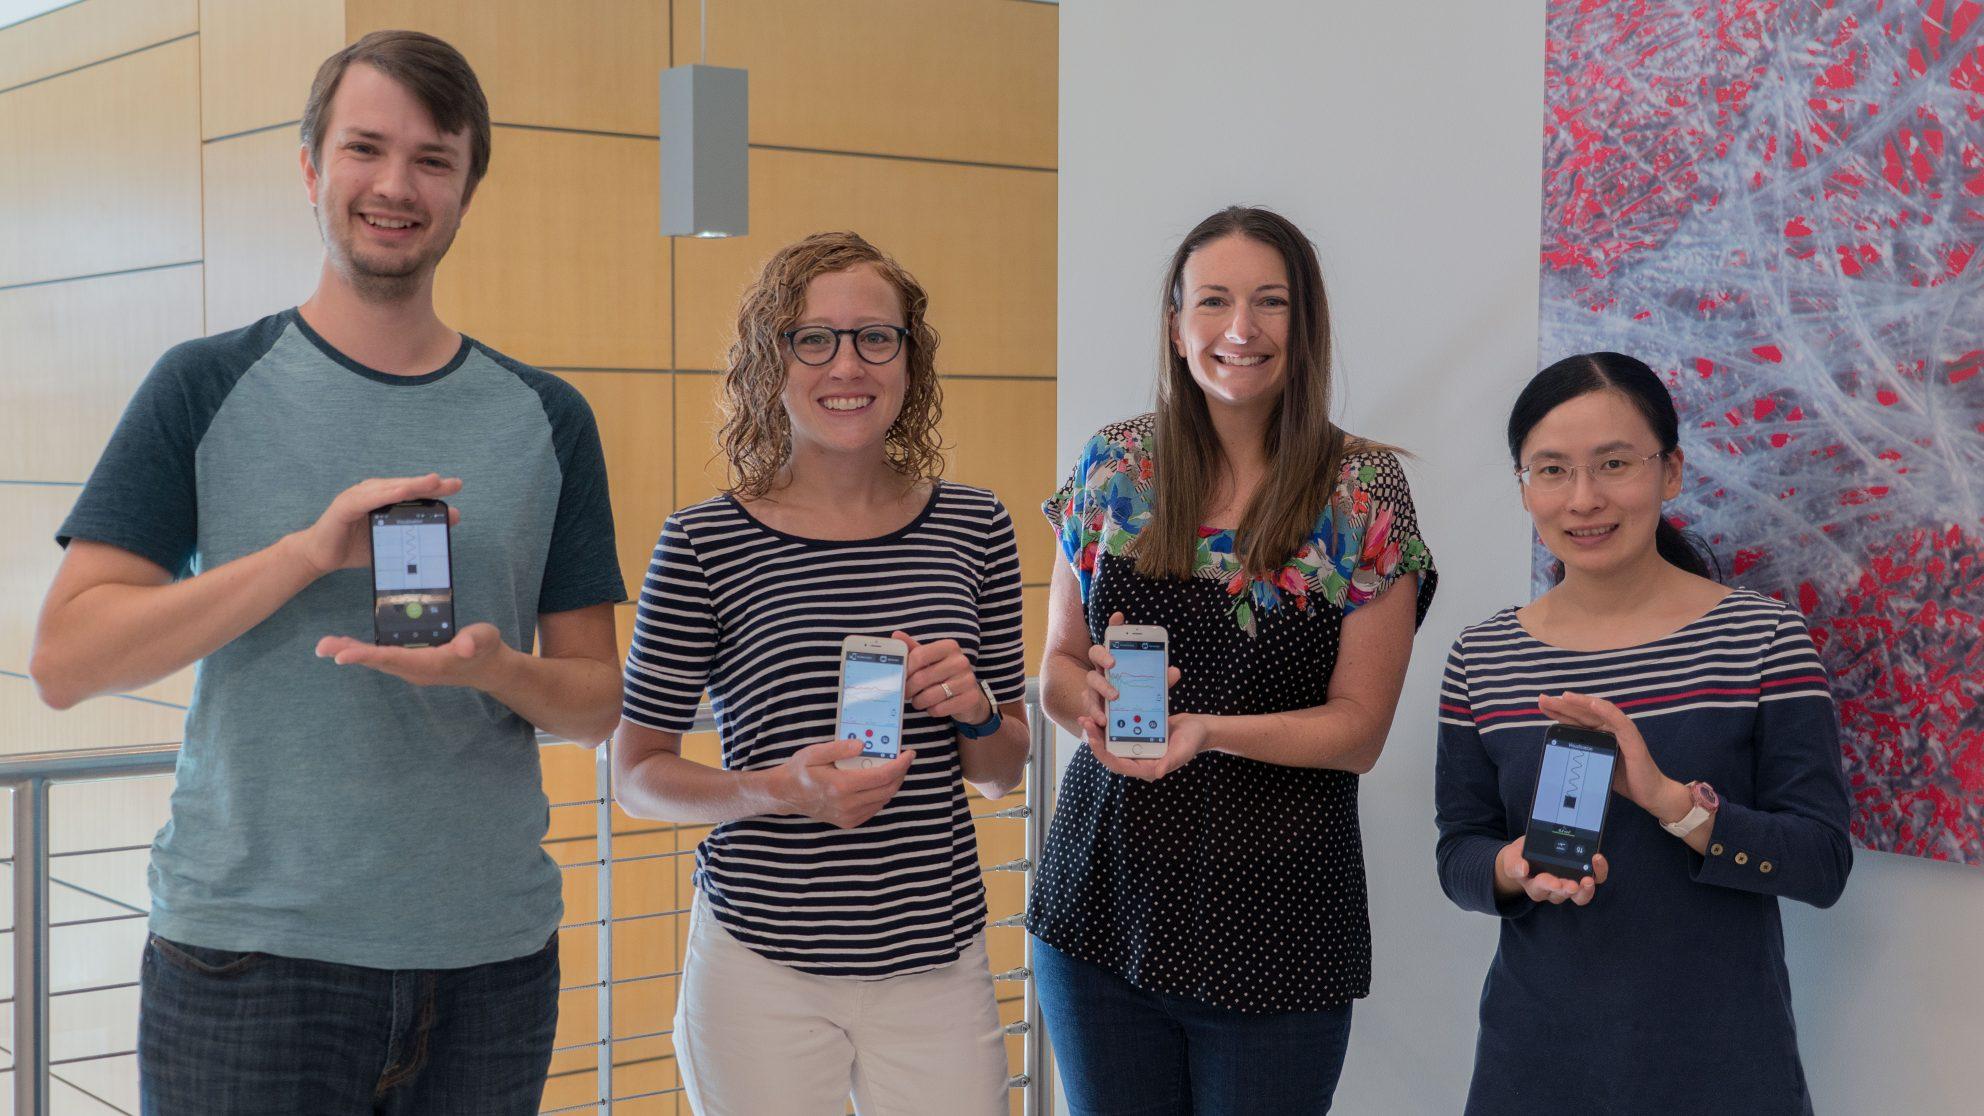 Physics App Selected as a 2017 Campus Technology Impact Award